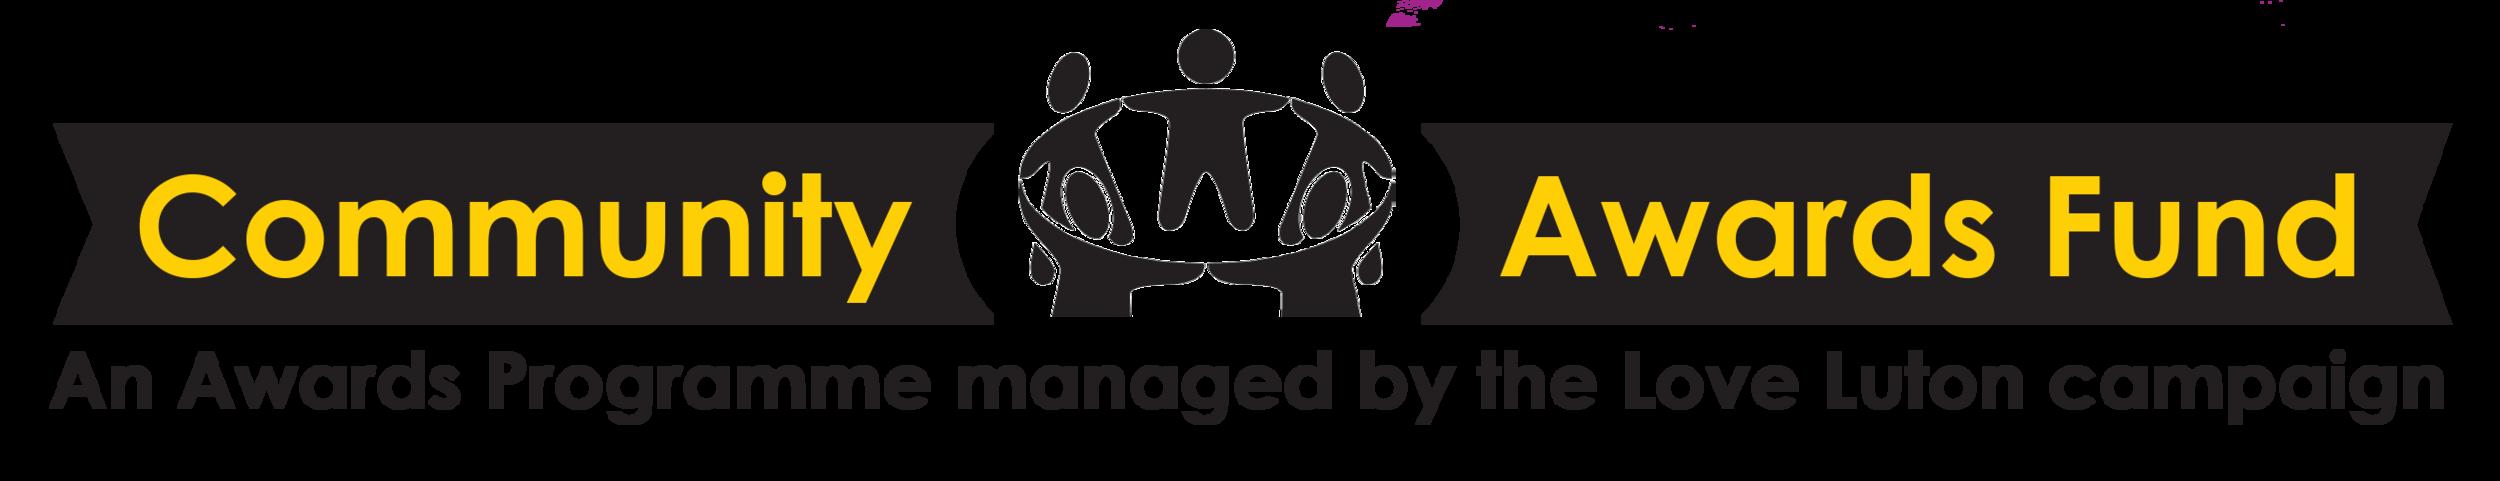 Community Awards Fund Logo